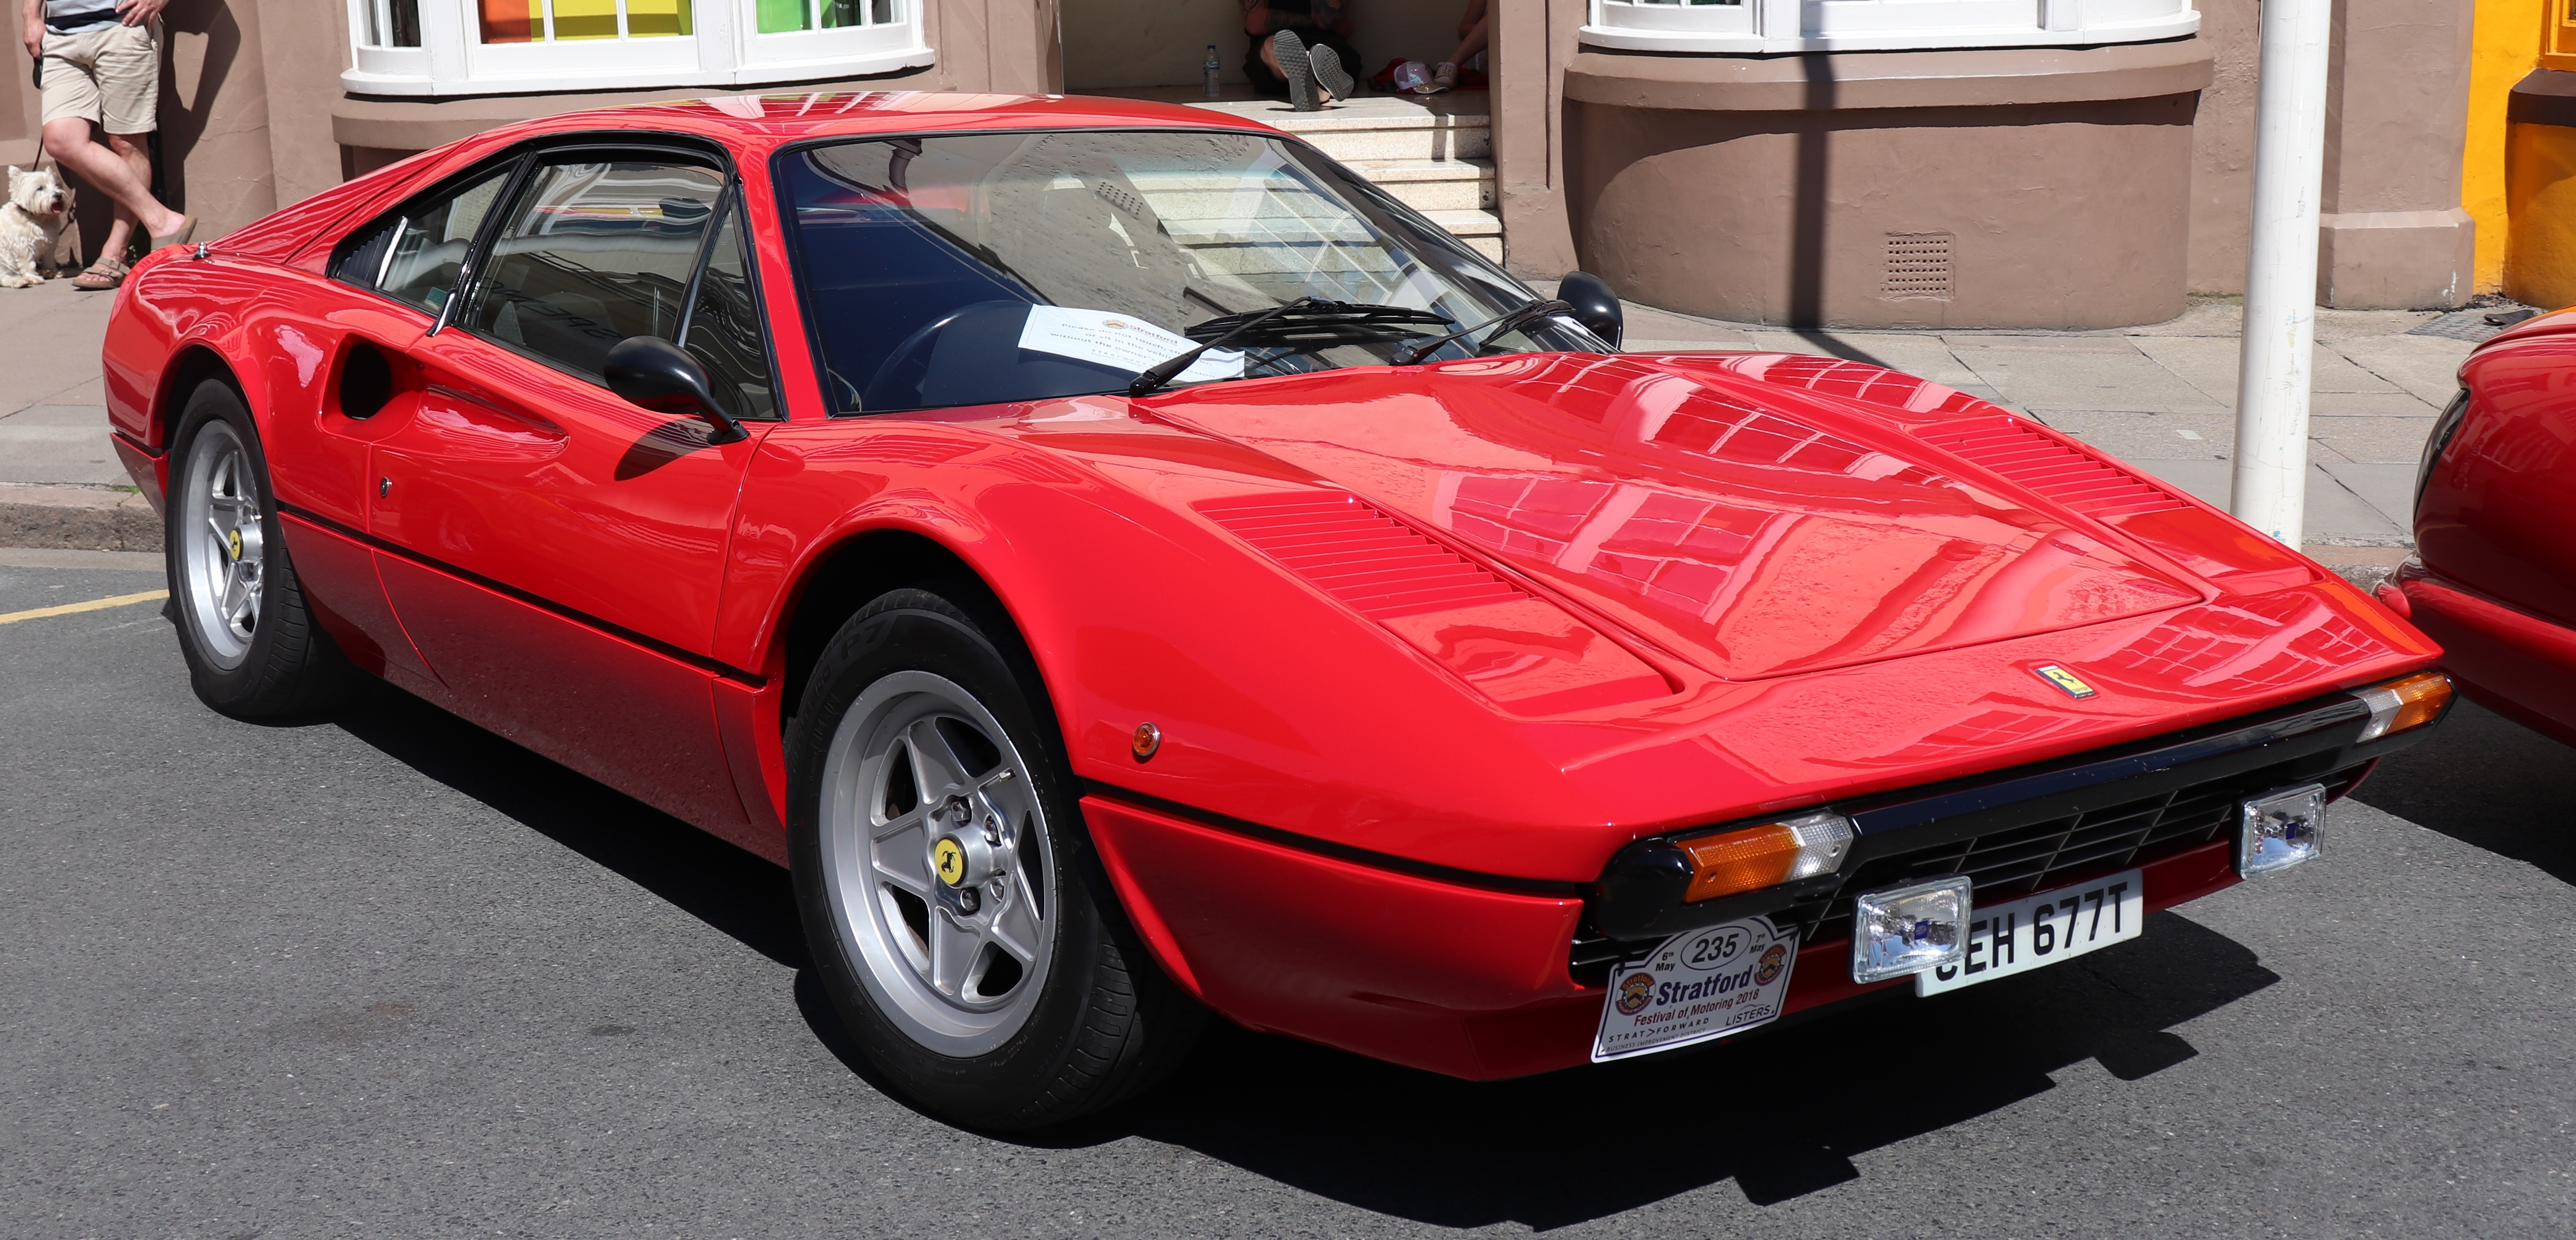 1978_Ferrari_308_GTB_2.9_(1).jpg